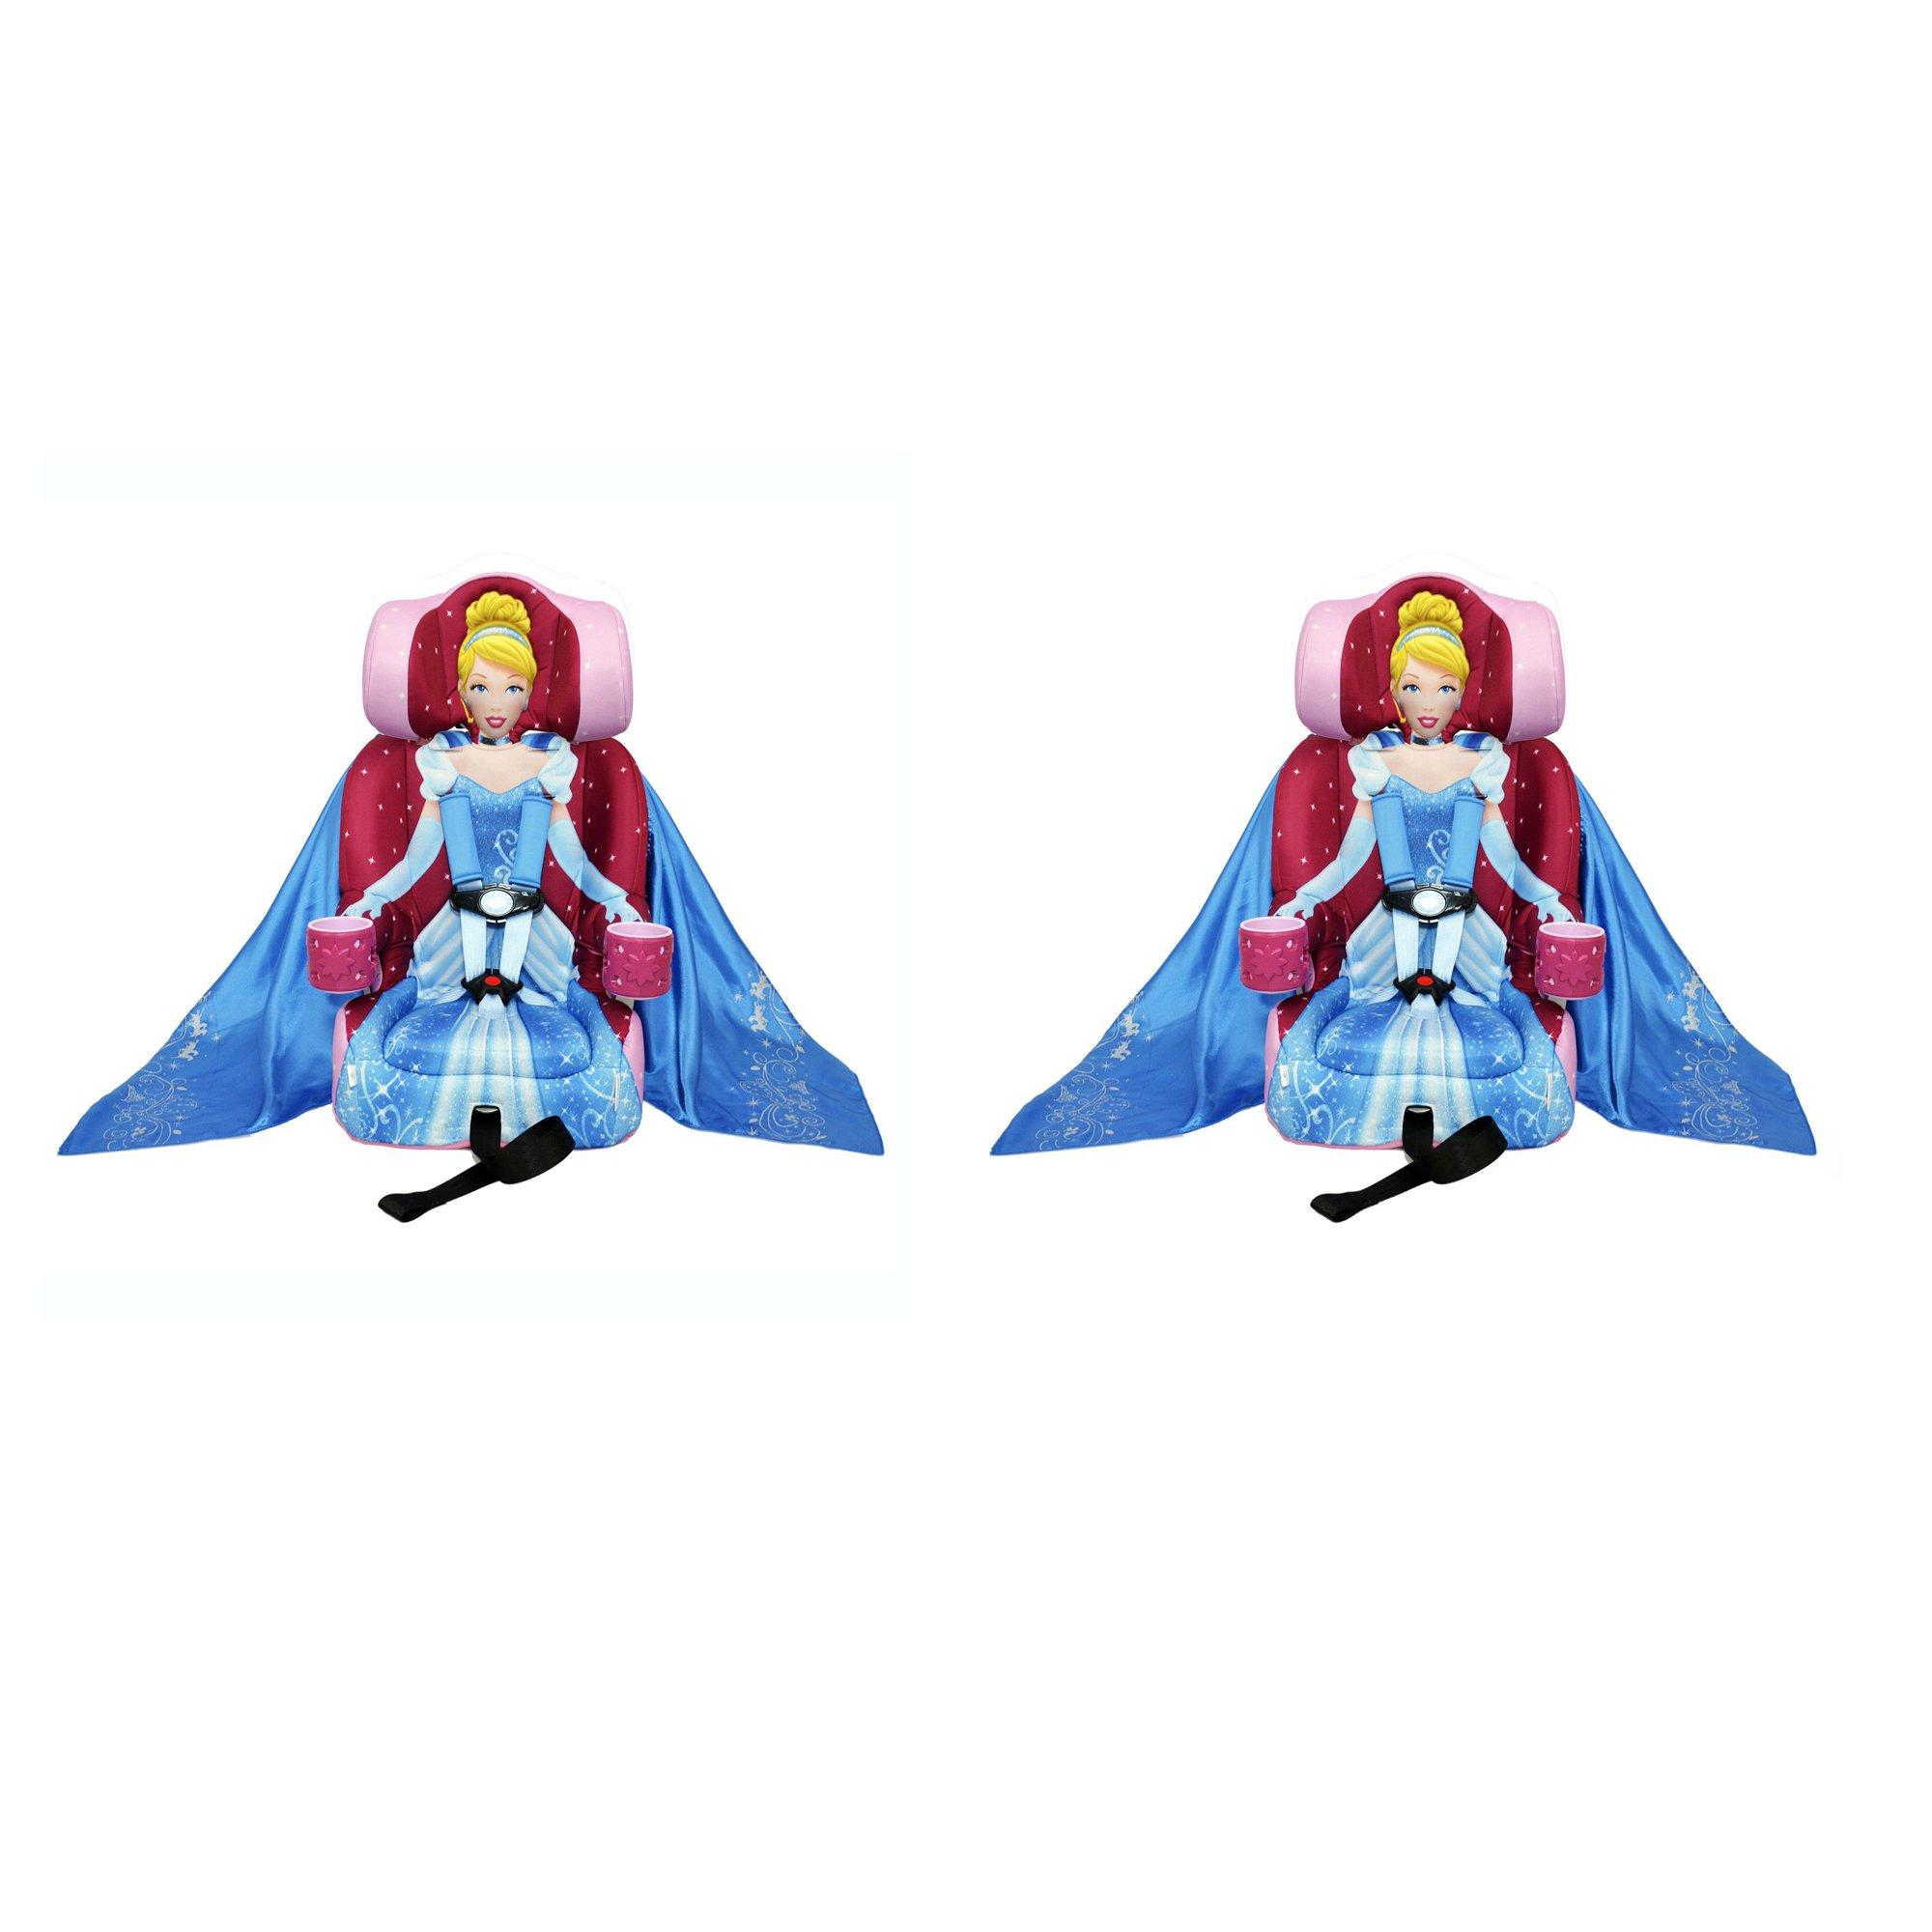 Kids Embrace Disney Cinderella Combo Harness Booster Toddler Car Seat  (2 Pack)